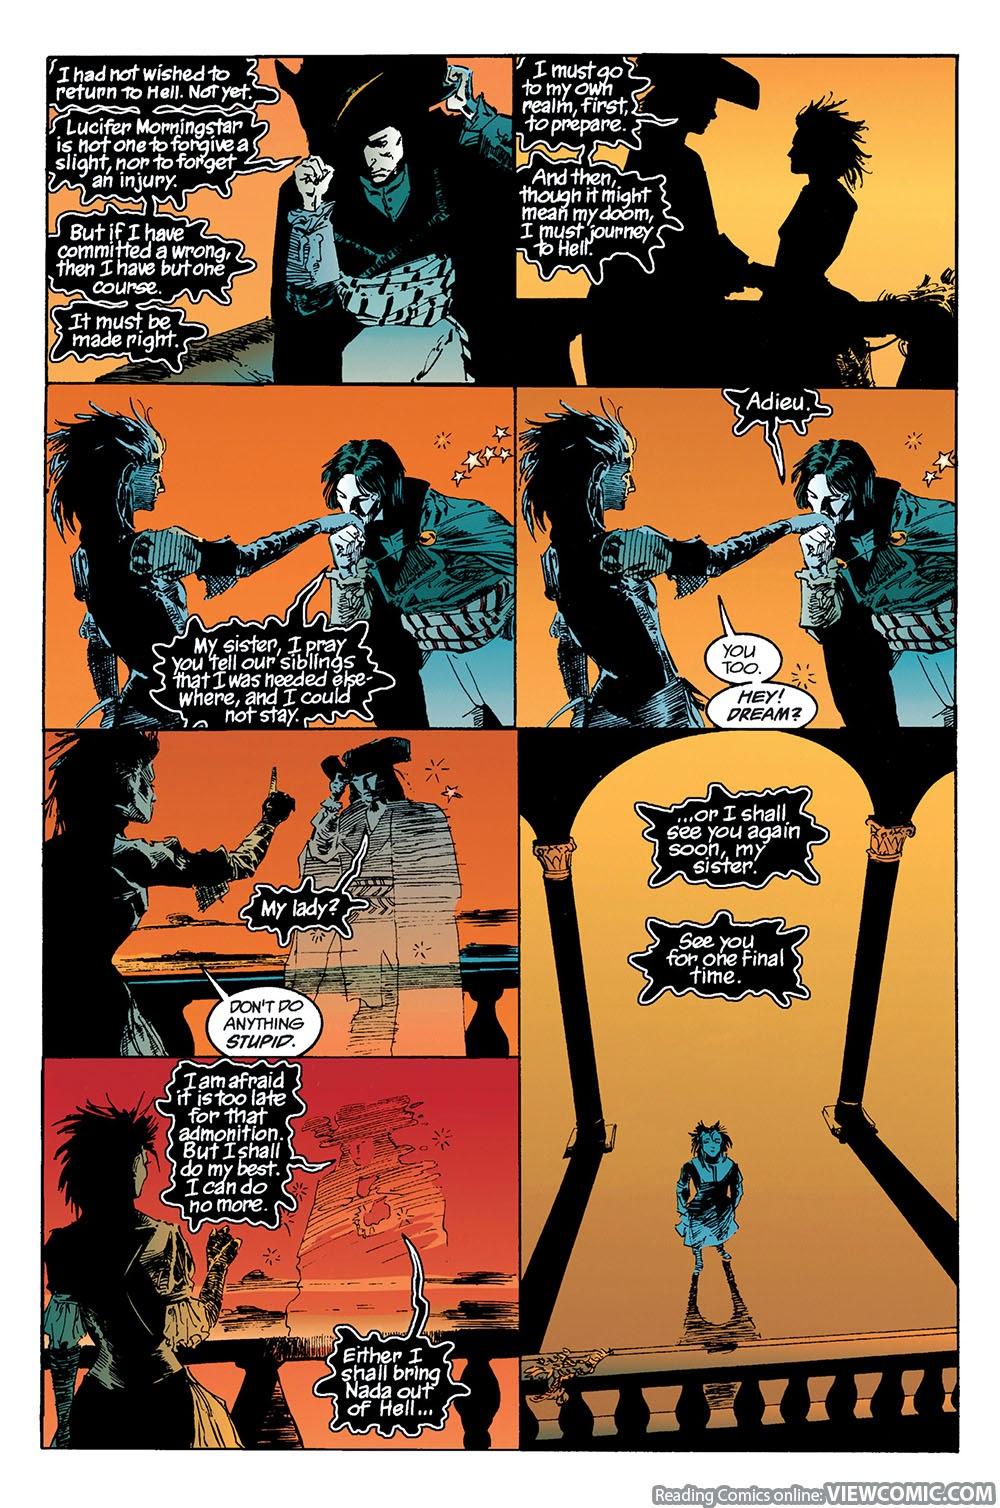 The Sandman v04 – Season Of Mists (2011) | Viewcomic reading comics